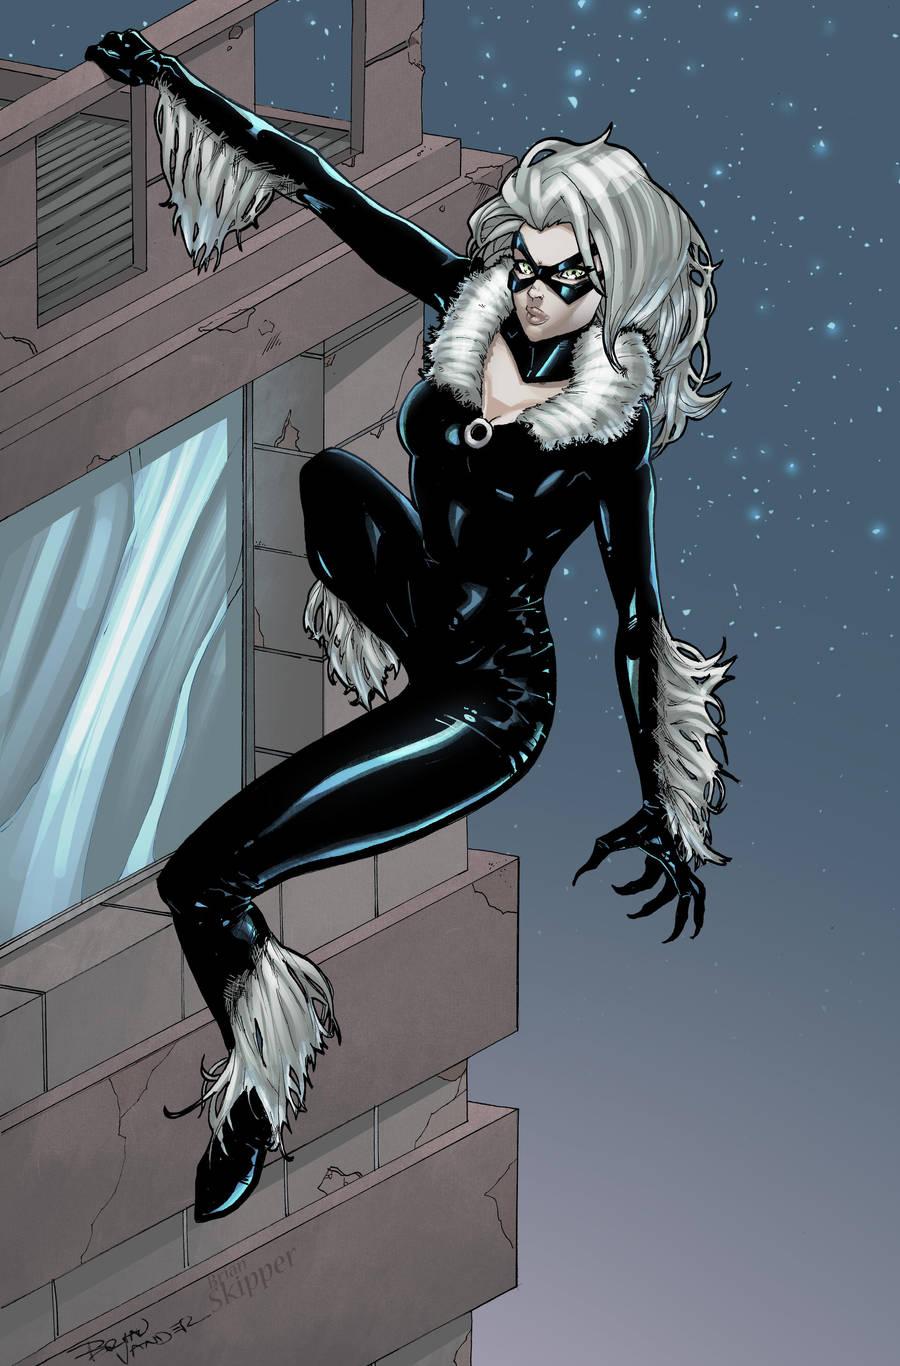 Blackcat by Brianskipper